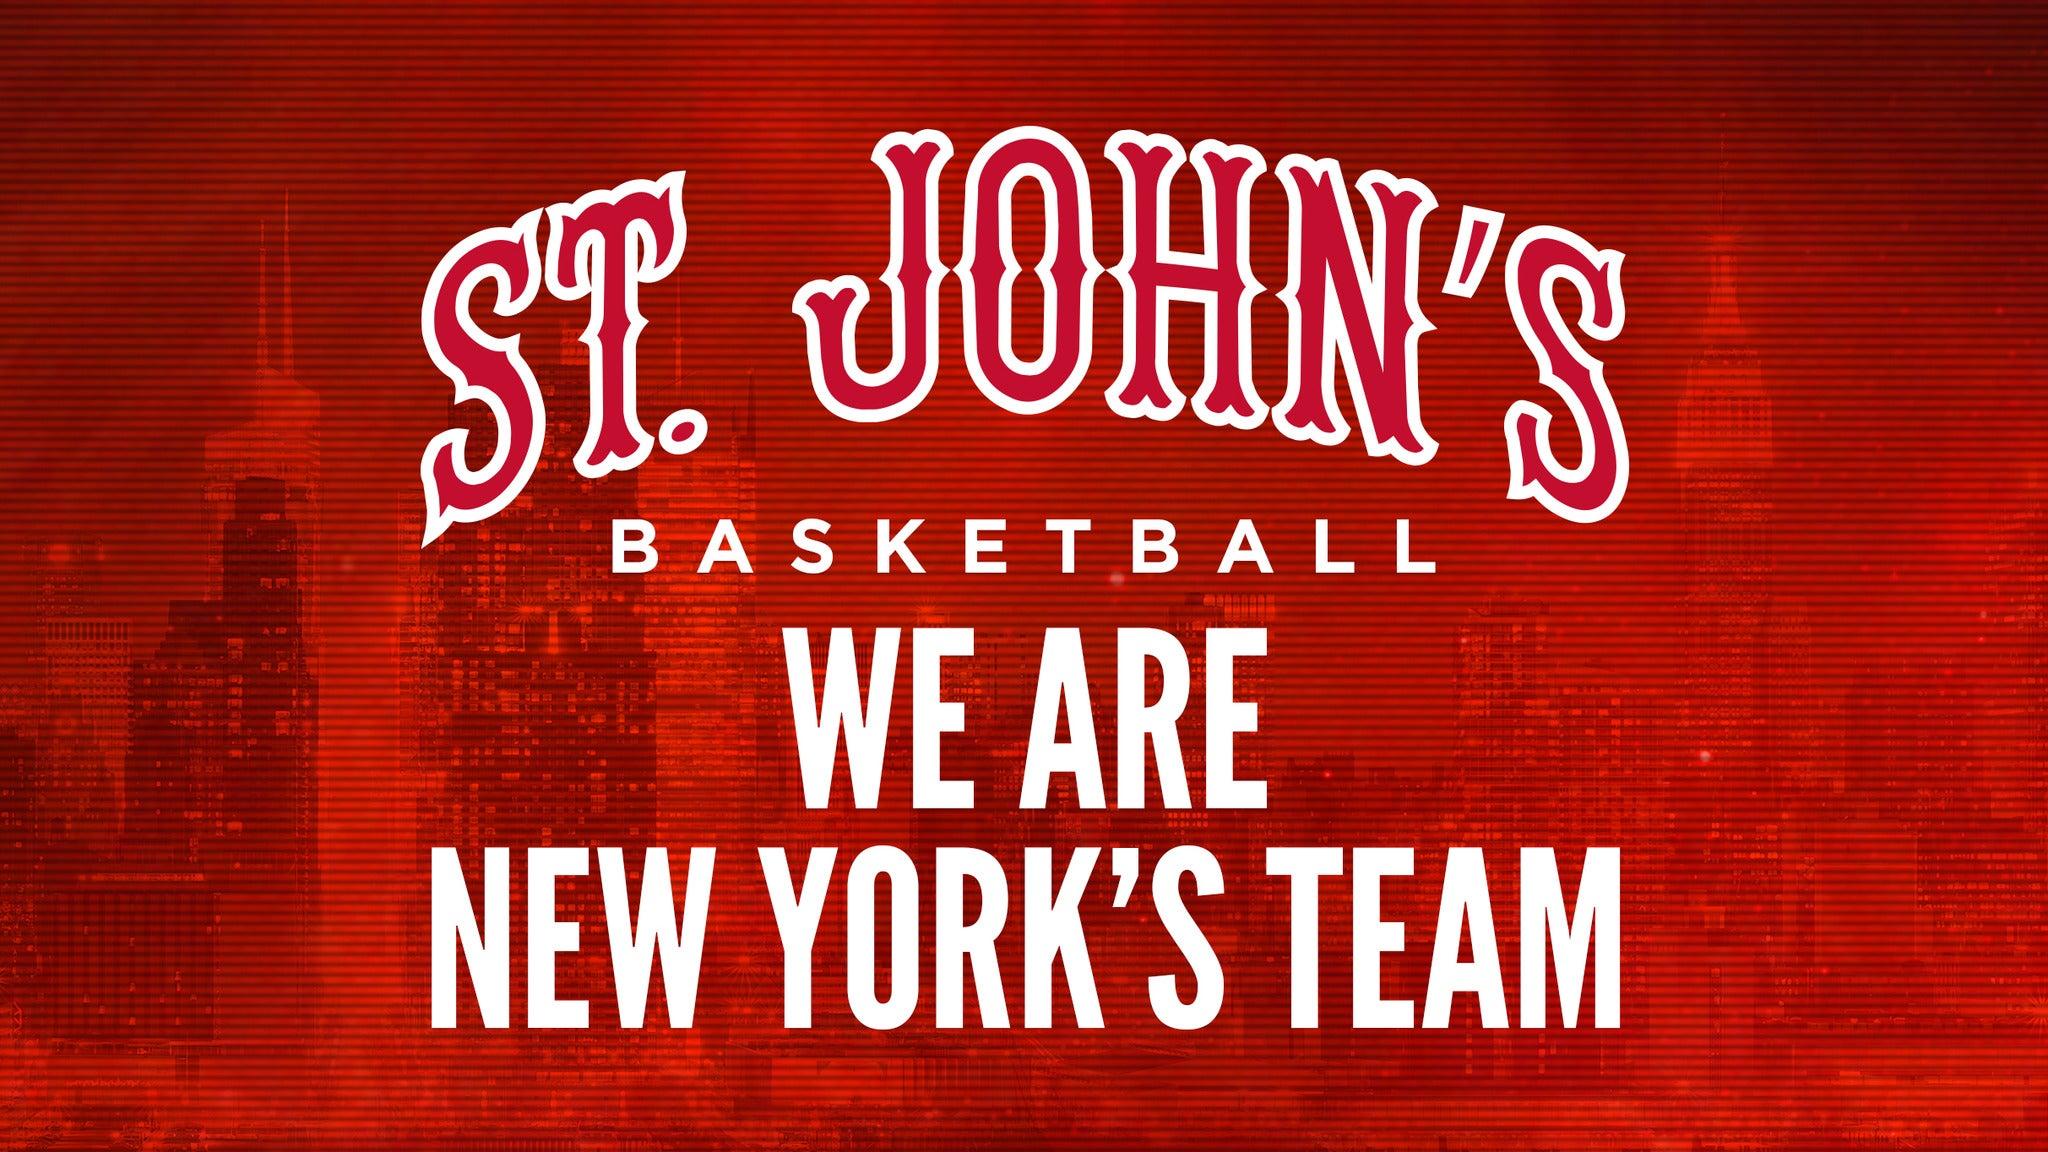 St. John's Red Storm Men's Basketball vs. Seton Hall Pirates Men's Basketball